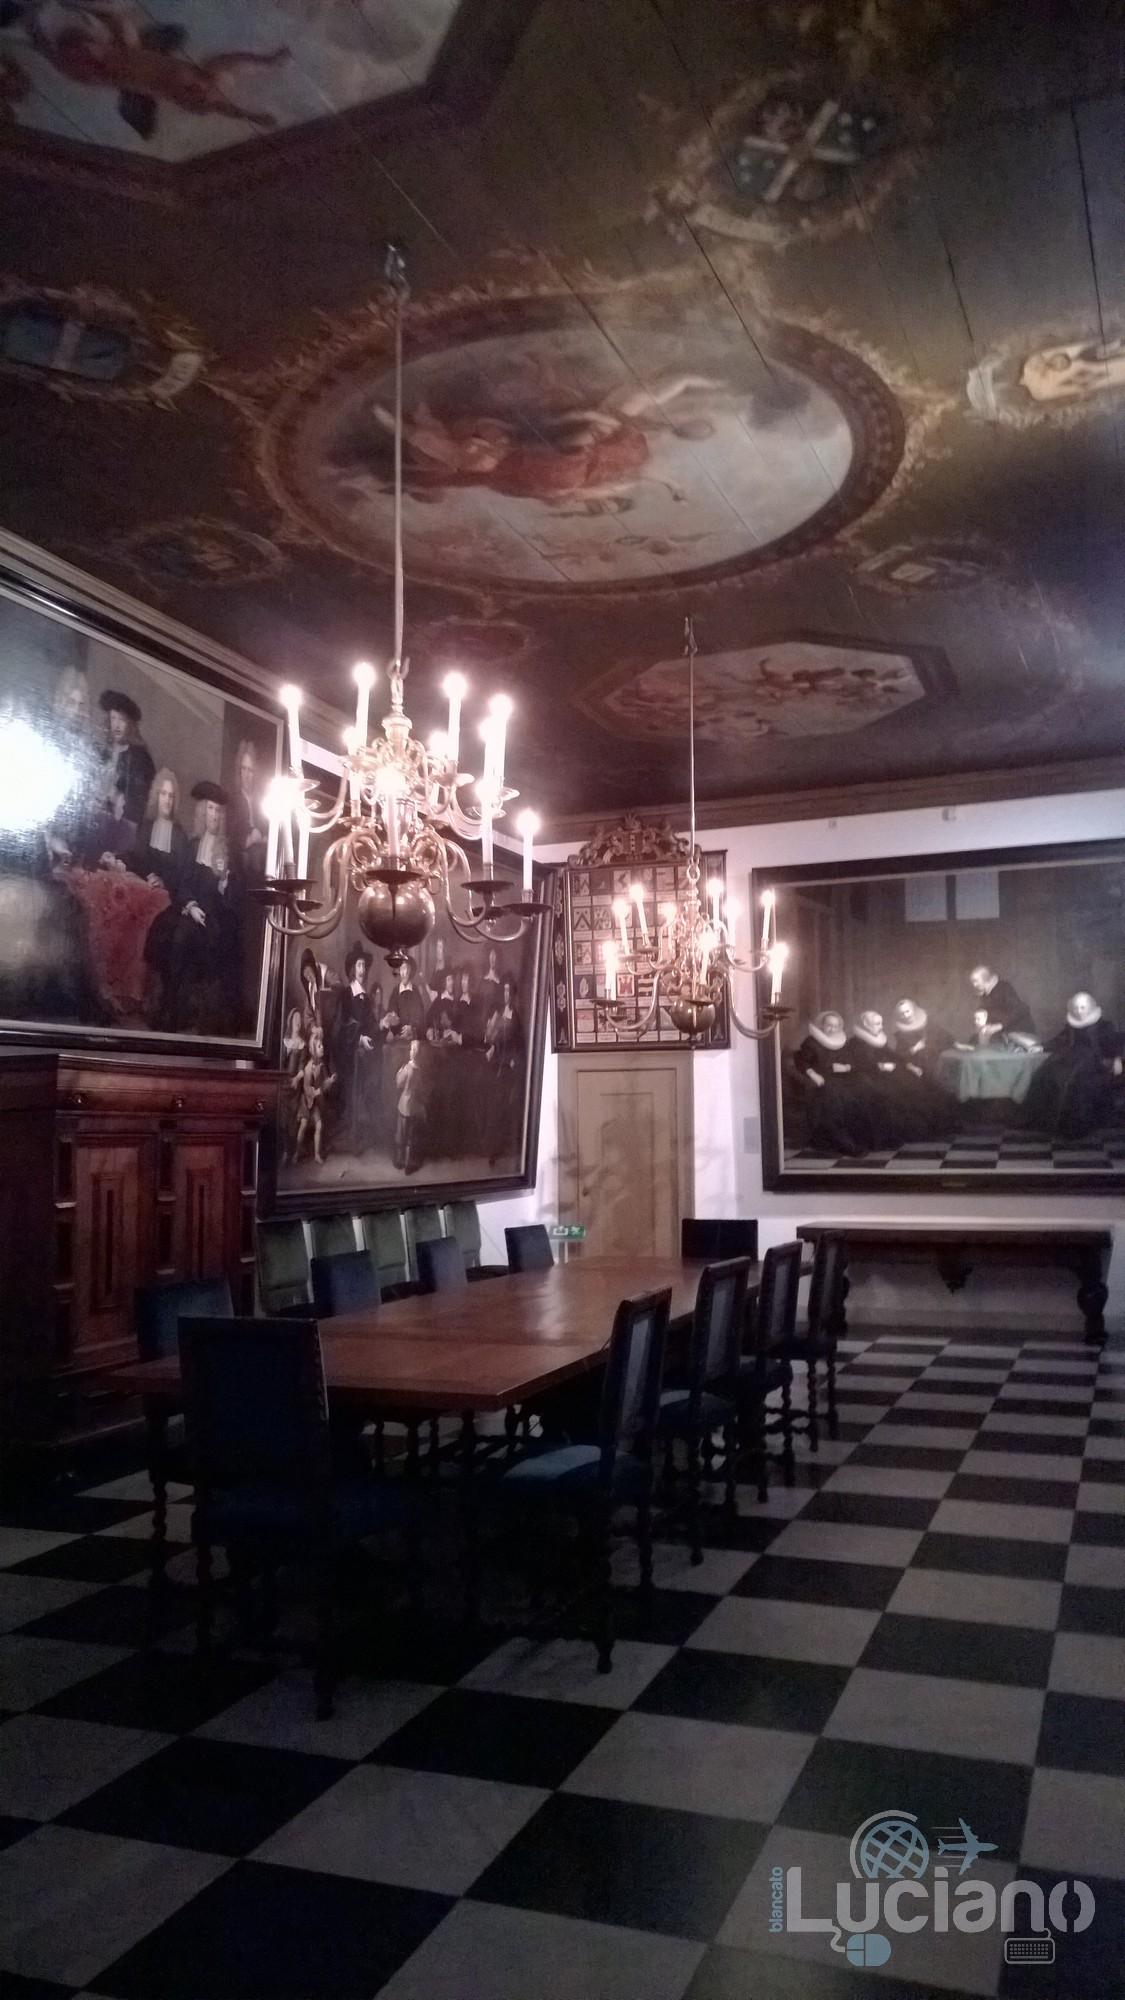 amsterdam-2014-vueling-lucianoblancatoit (128)